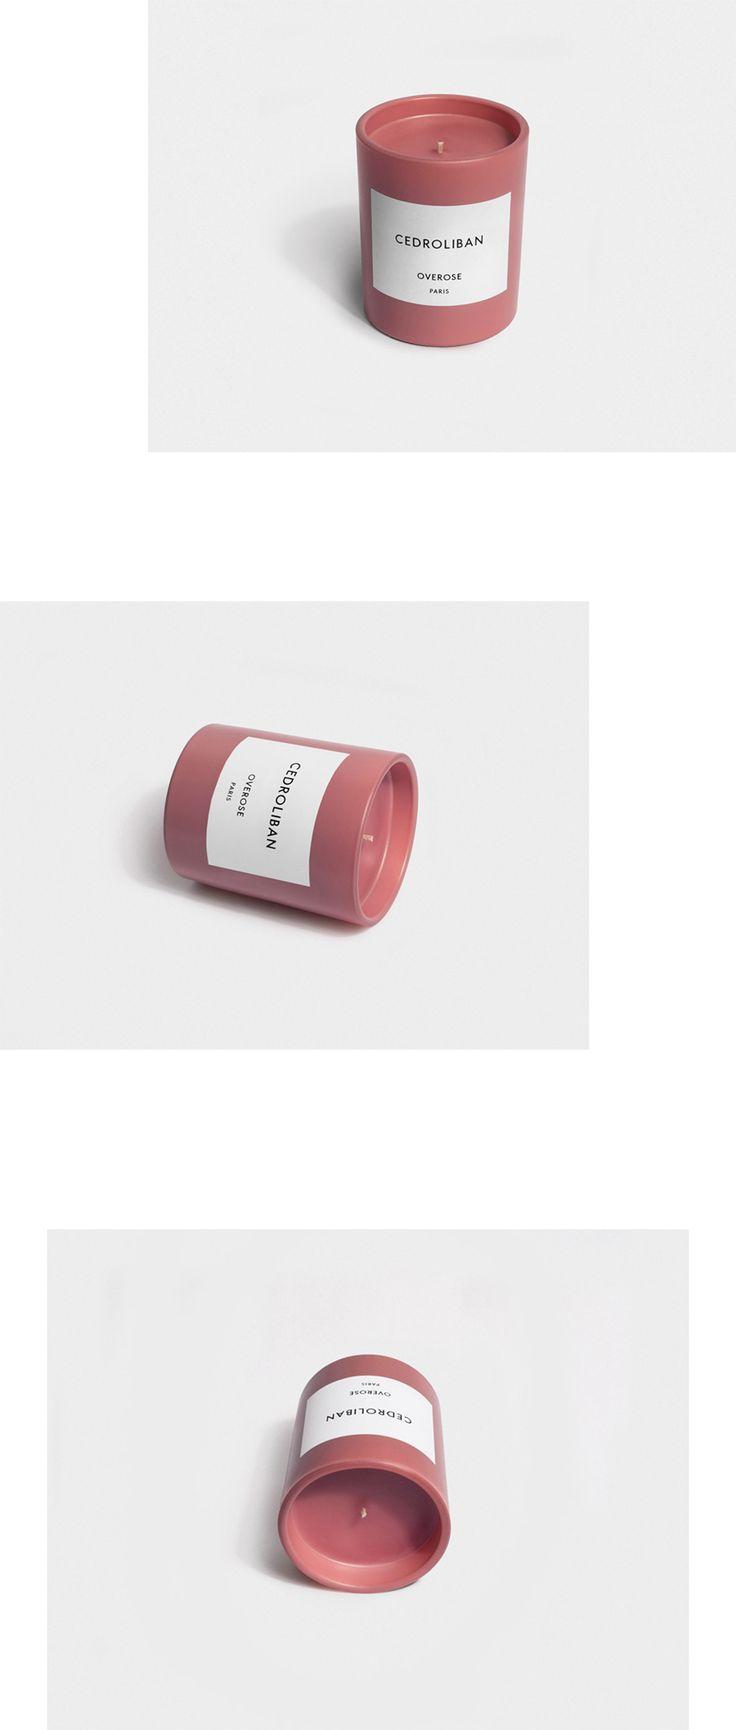 OVEROSE Cedroliban is an olibanum/cedarwood fragranced candle featuring the co-distillation of olibanum resinoid with a virginian cedarwood oil